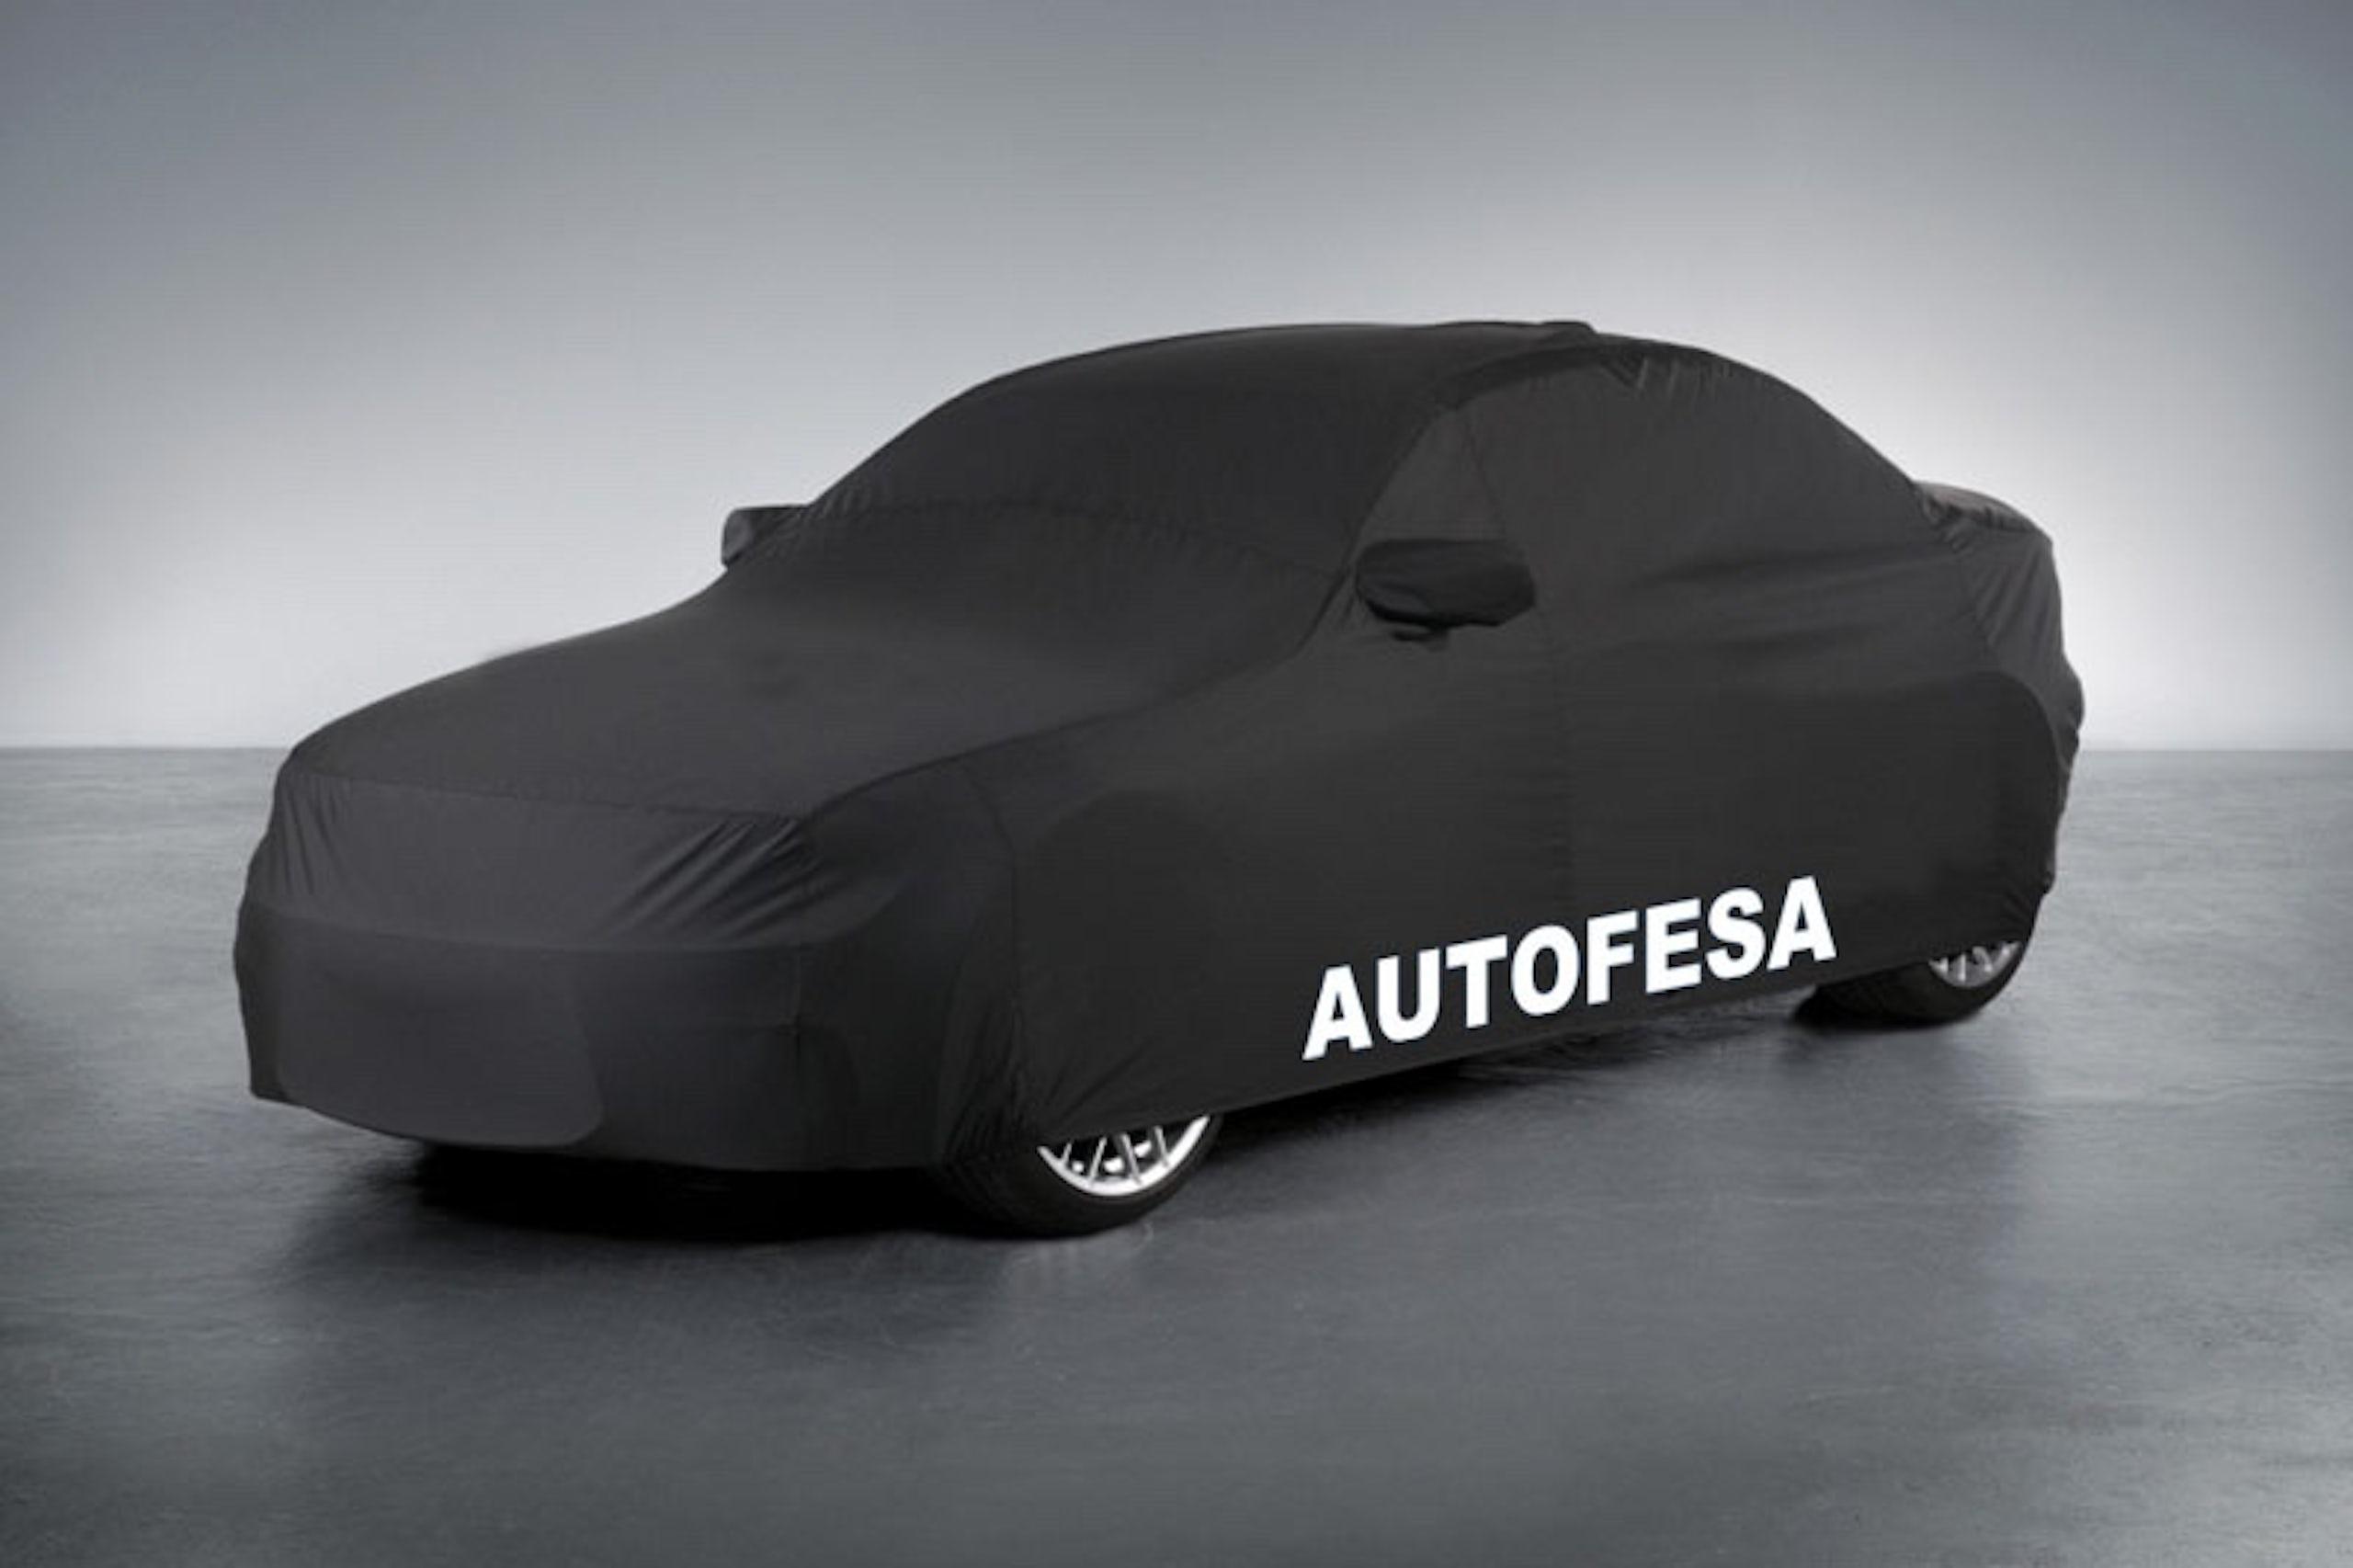 Audi A6 A6 3.0 TDI AVANT 204cv quattro 5p S tronic Auto S/S - Foto 2